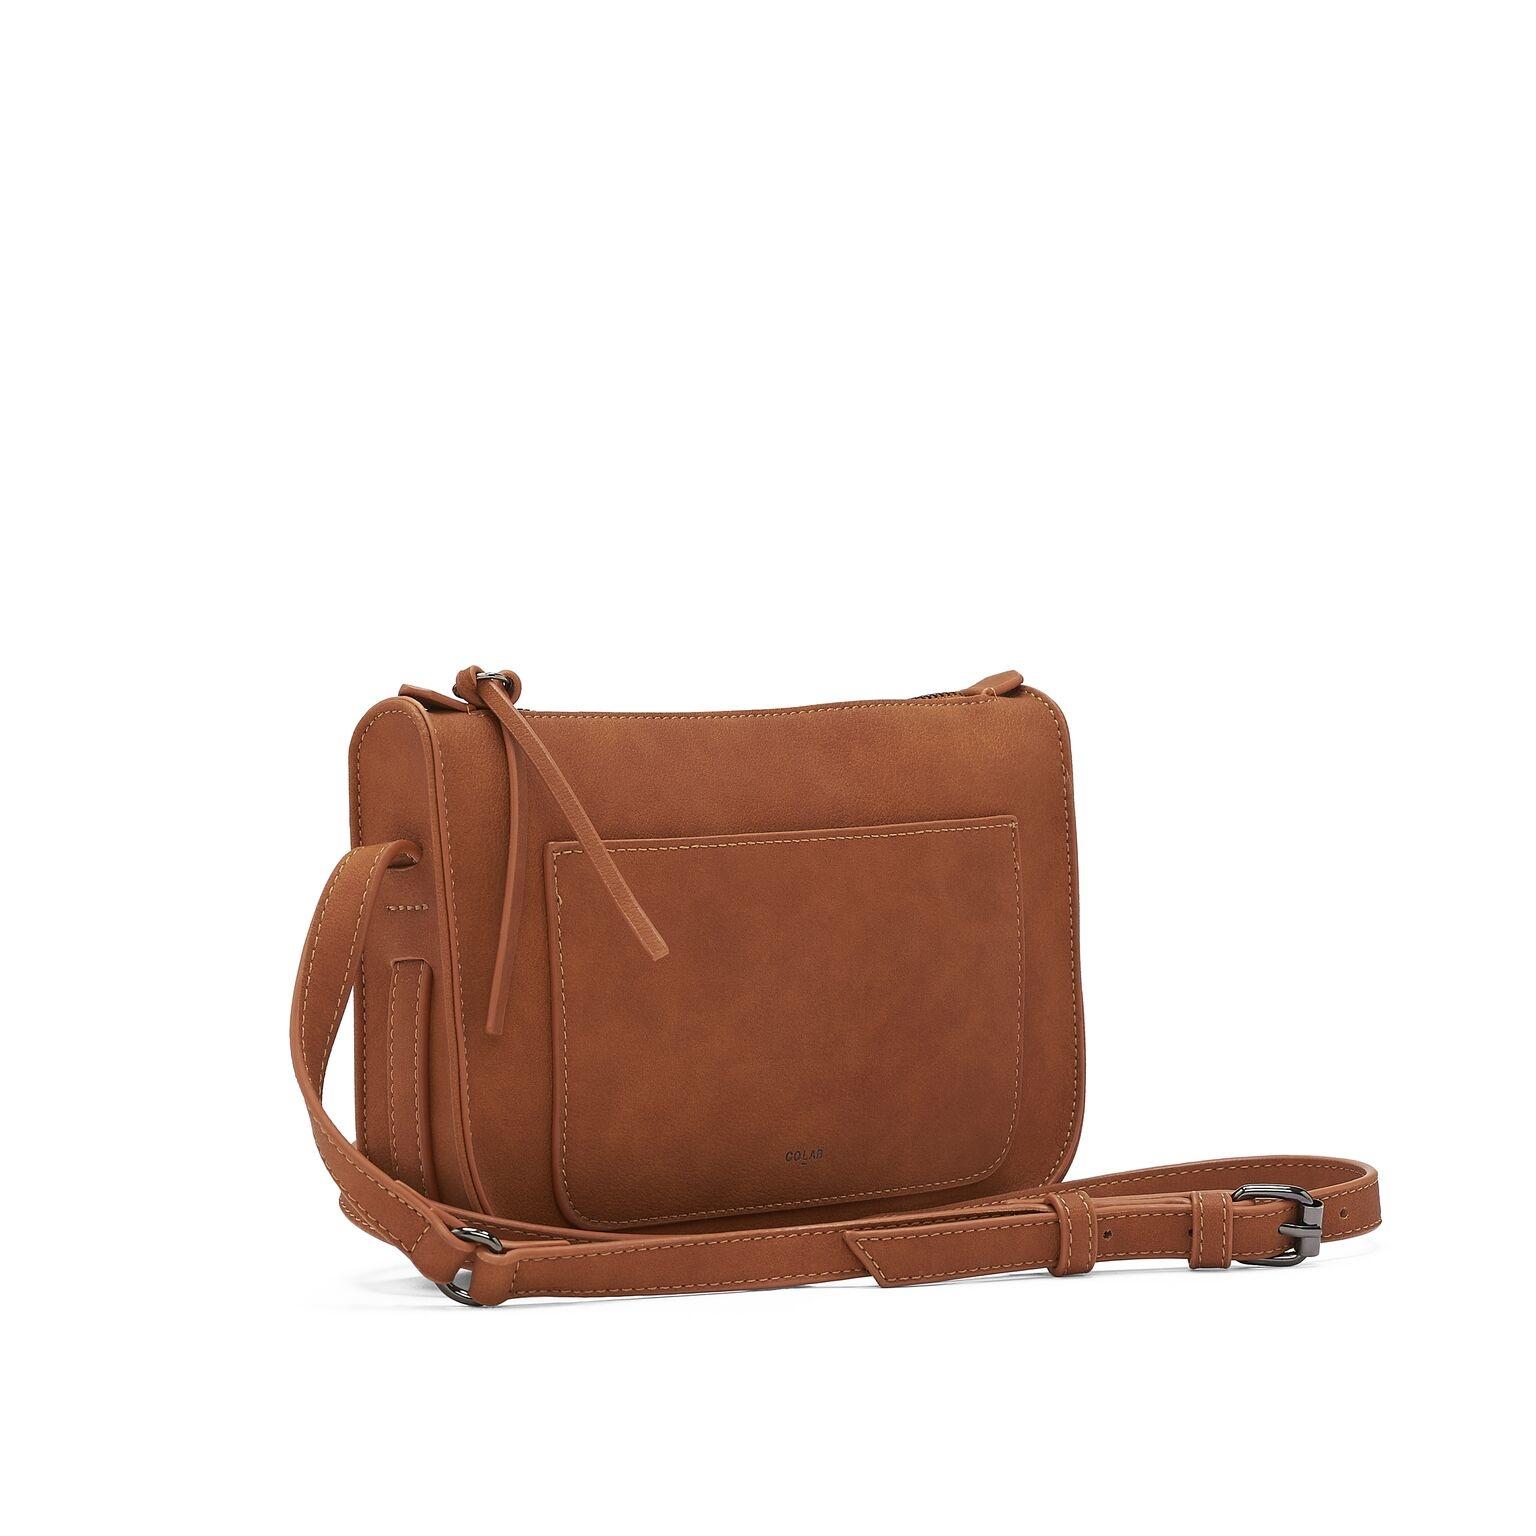 Co-lab Cognac Crossbody Bag